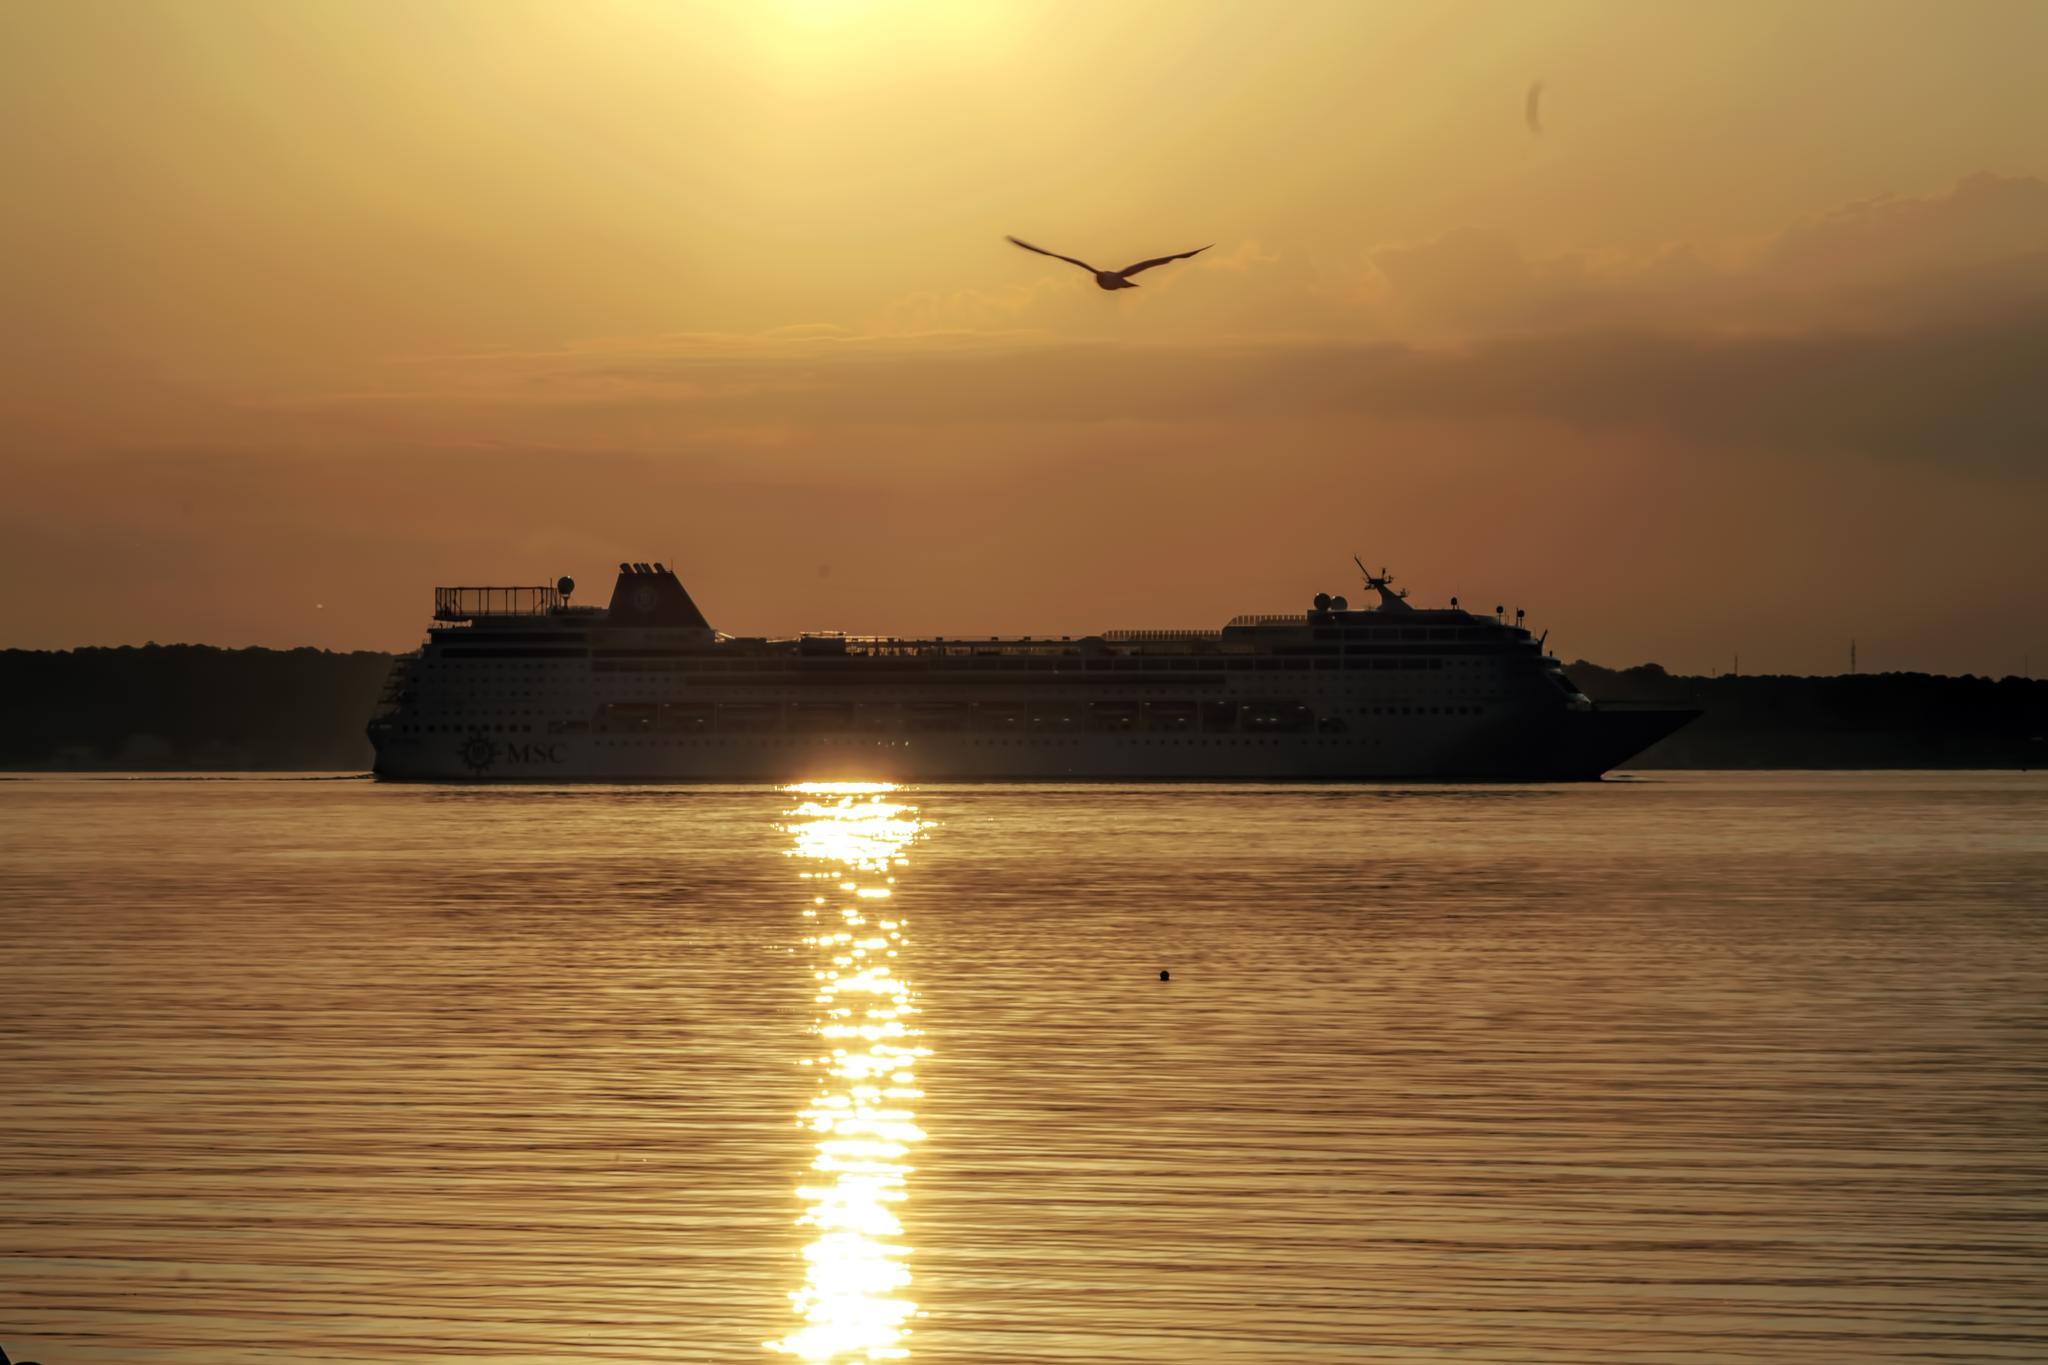 MSC Sinfonia in the morning light by M. Loeth